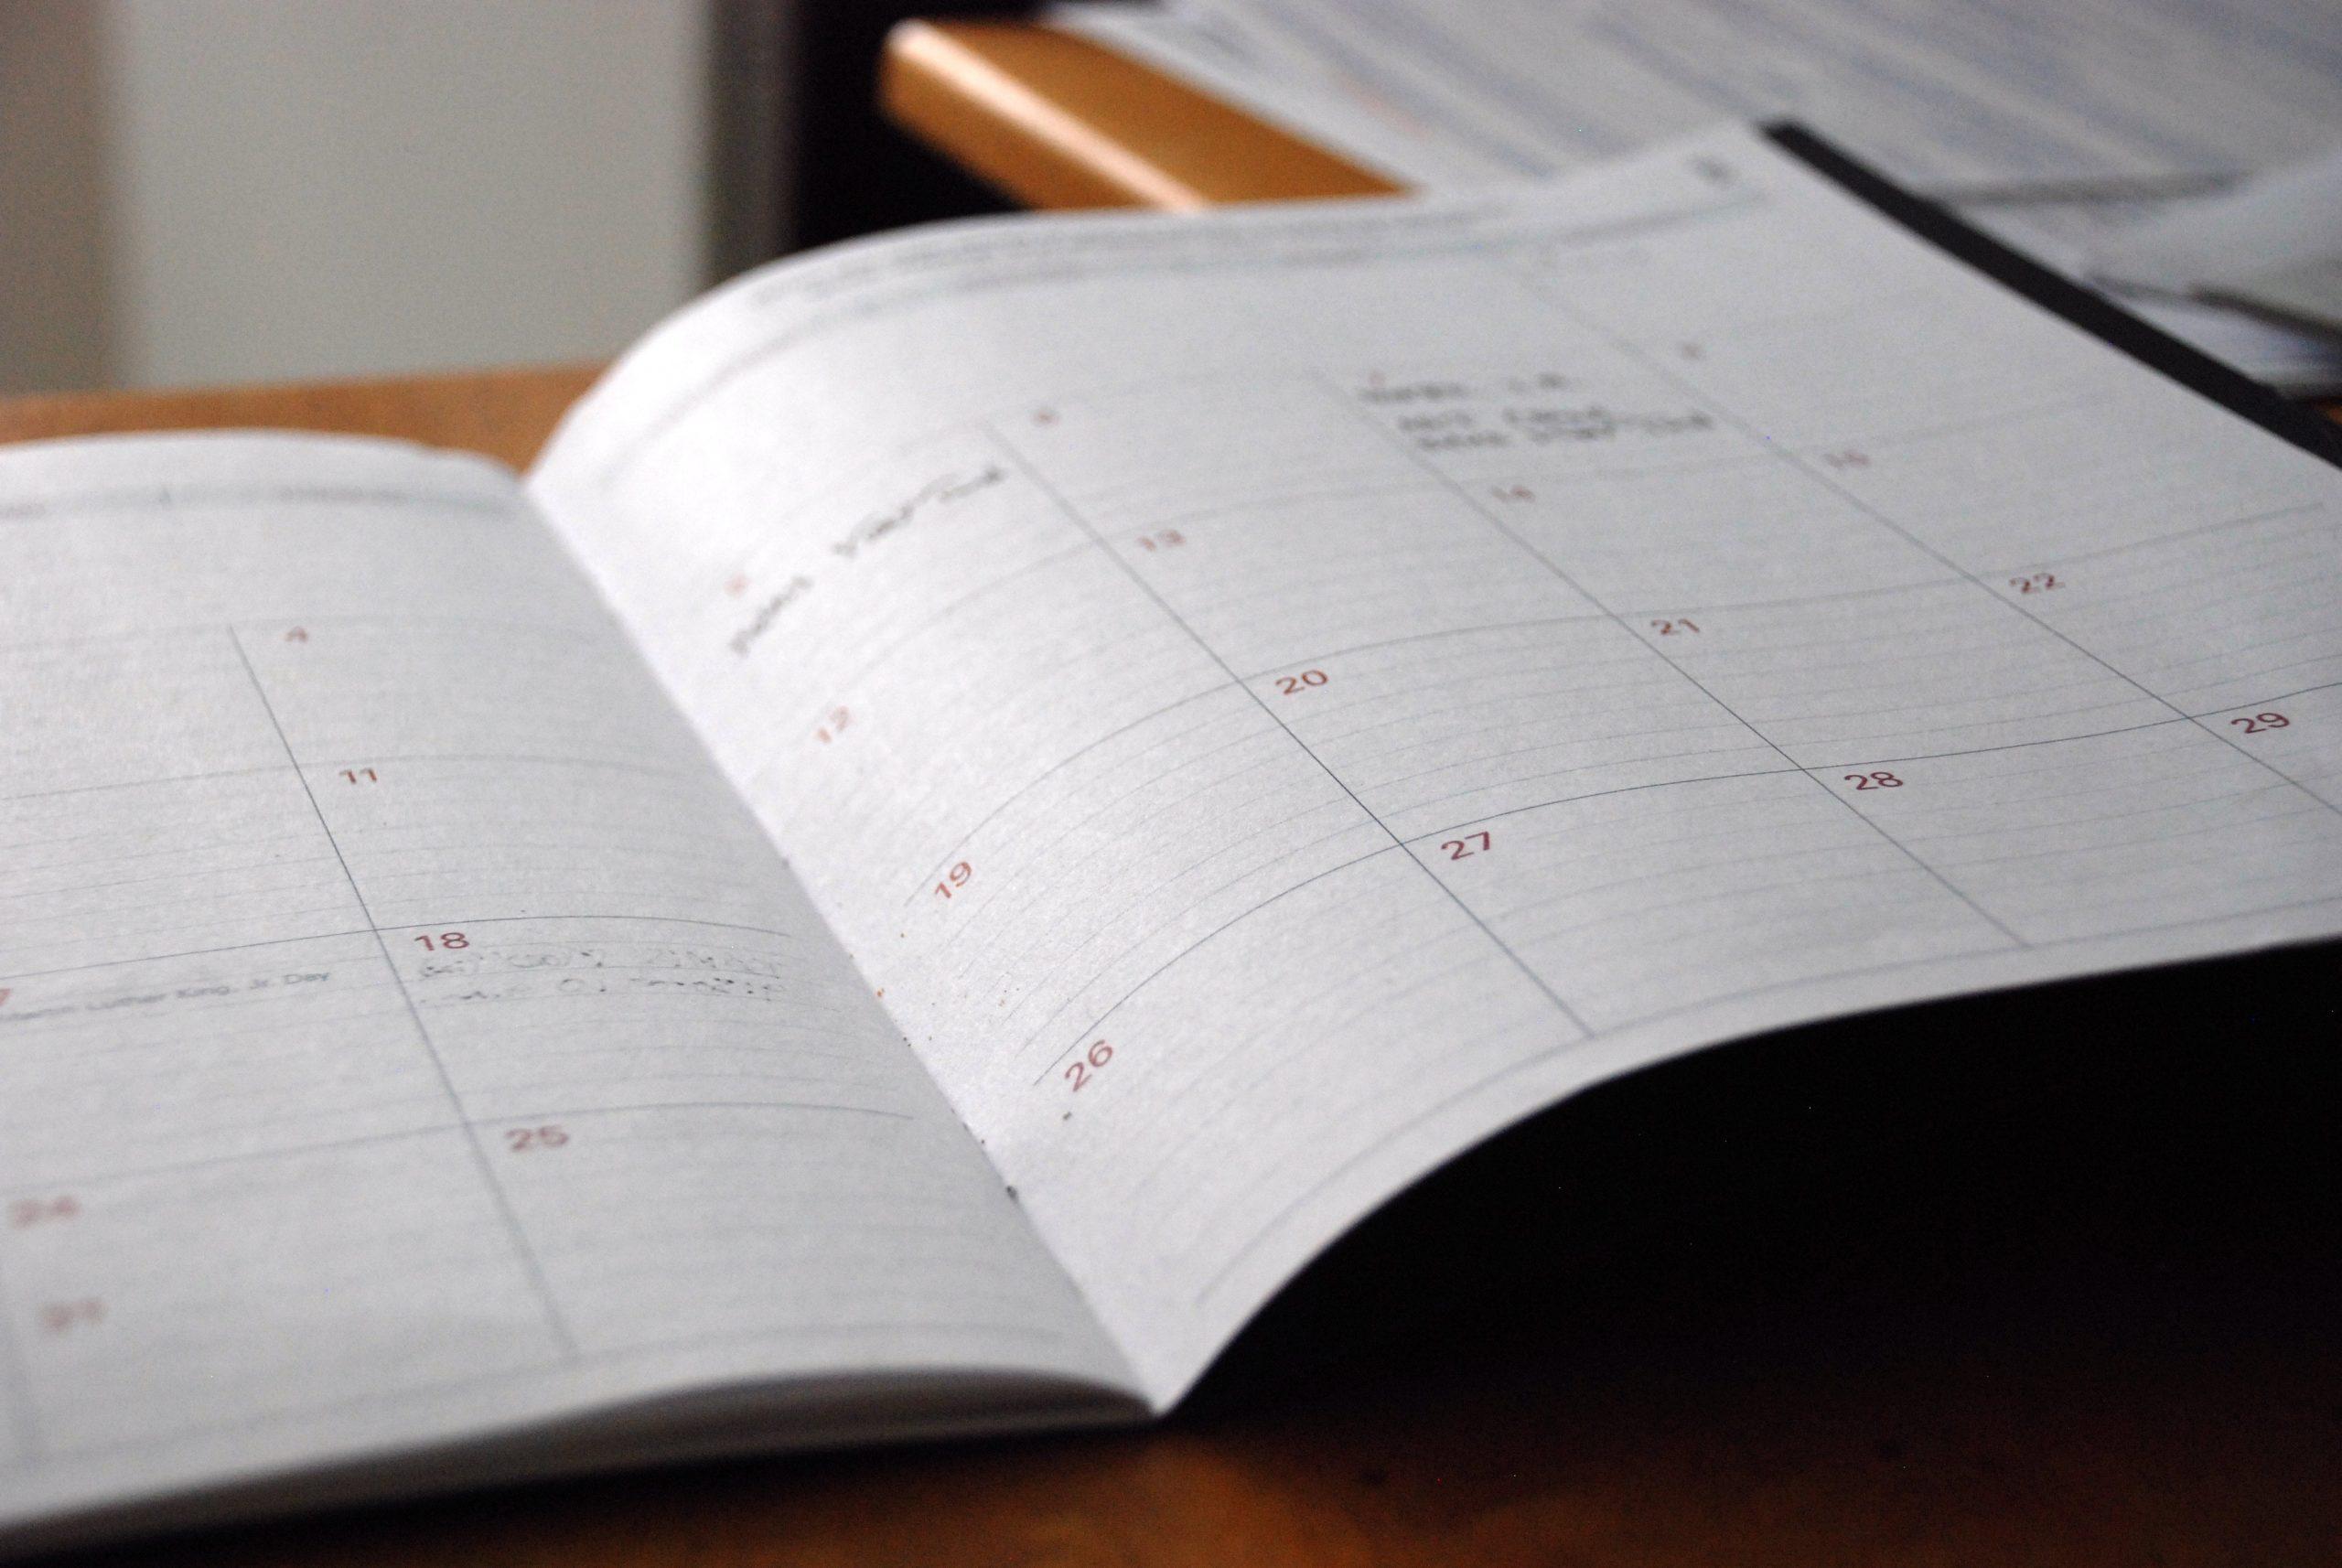 generic image of a calendar